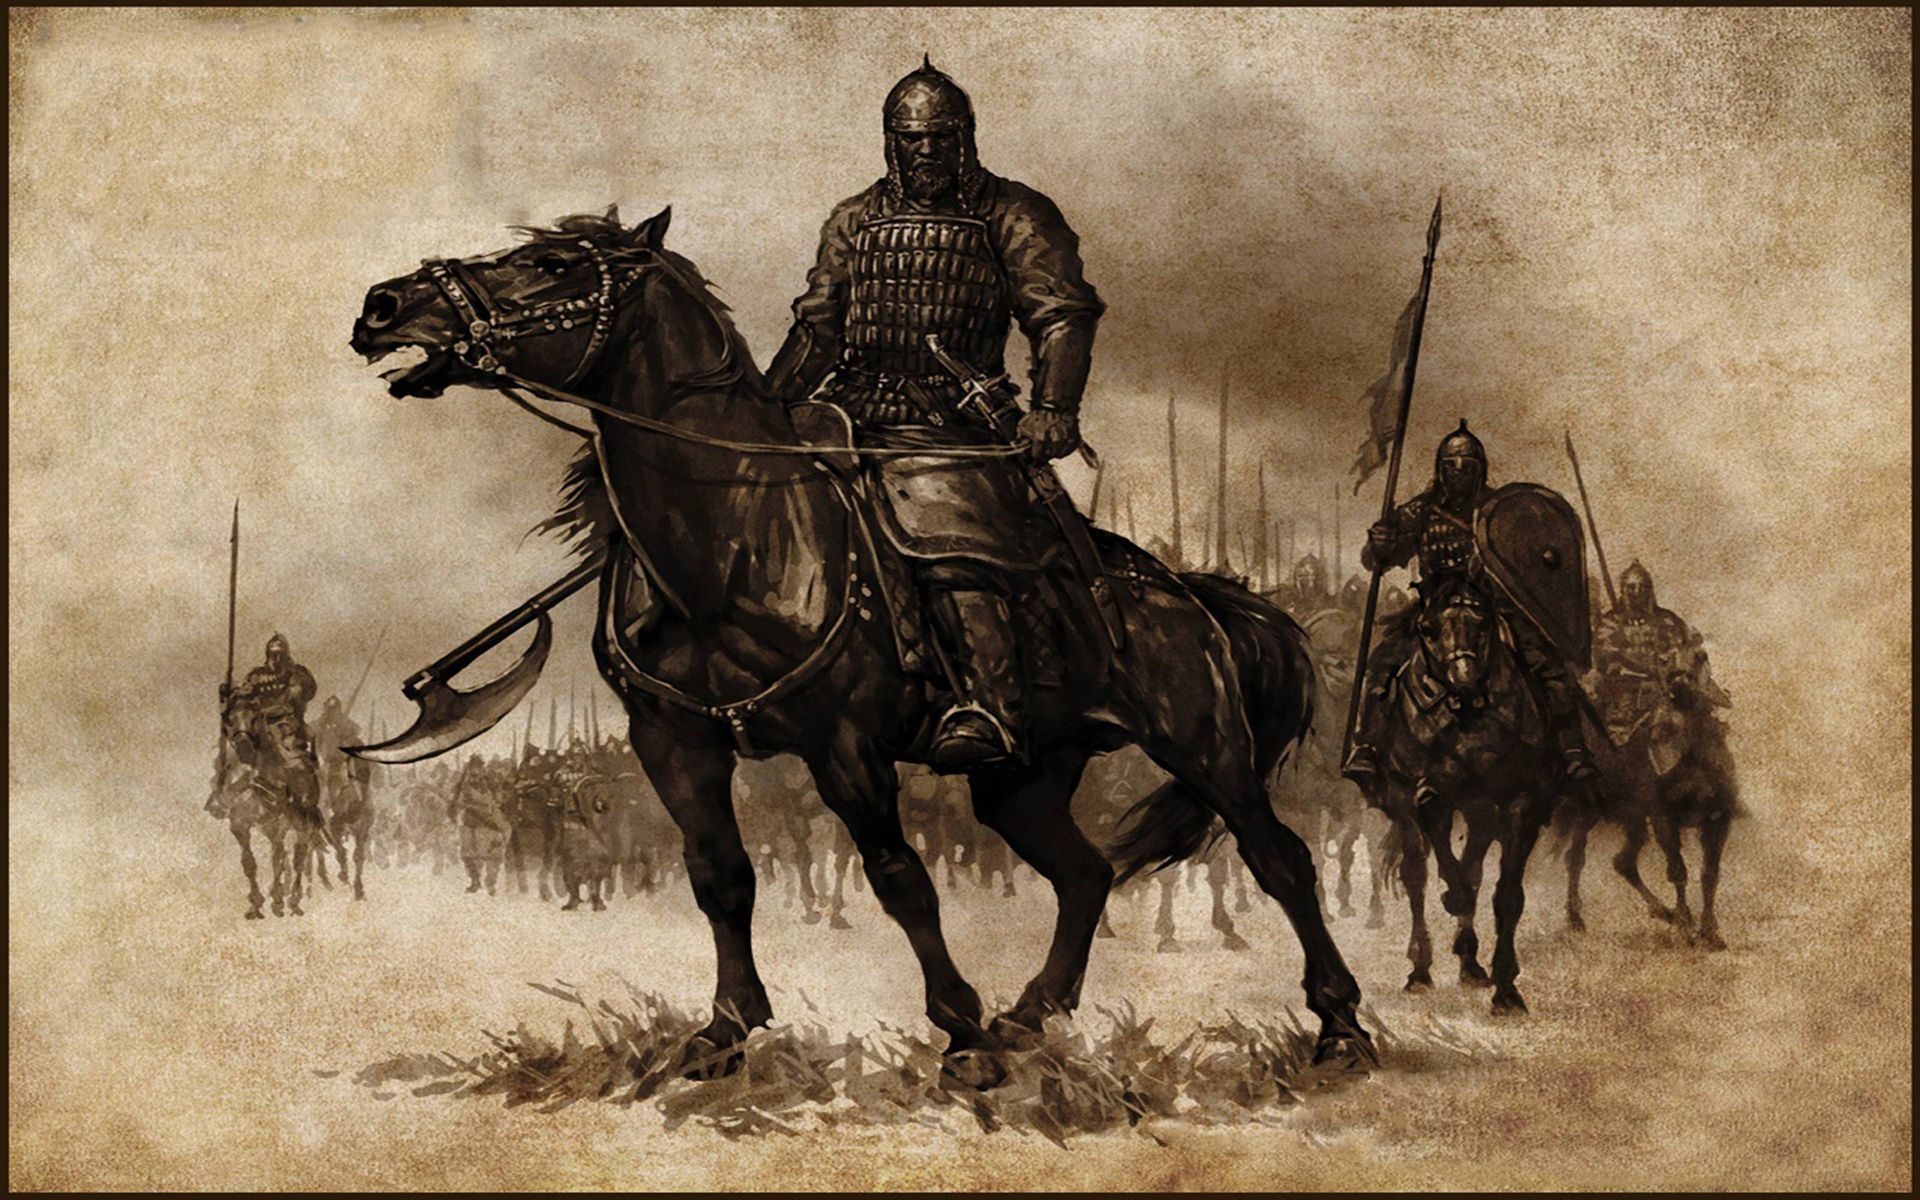 Top Wallpaper Horse Warrior - 77686bce7b8a6dad38e14803f3f930f2  Image_108171.jpg